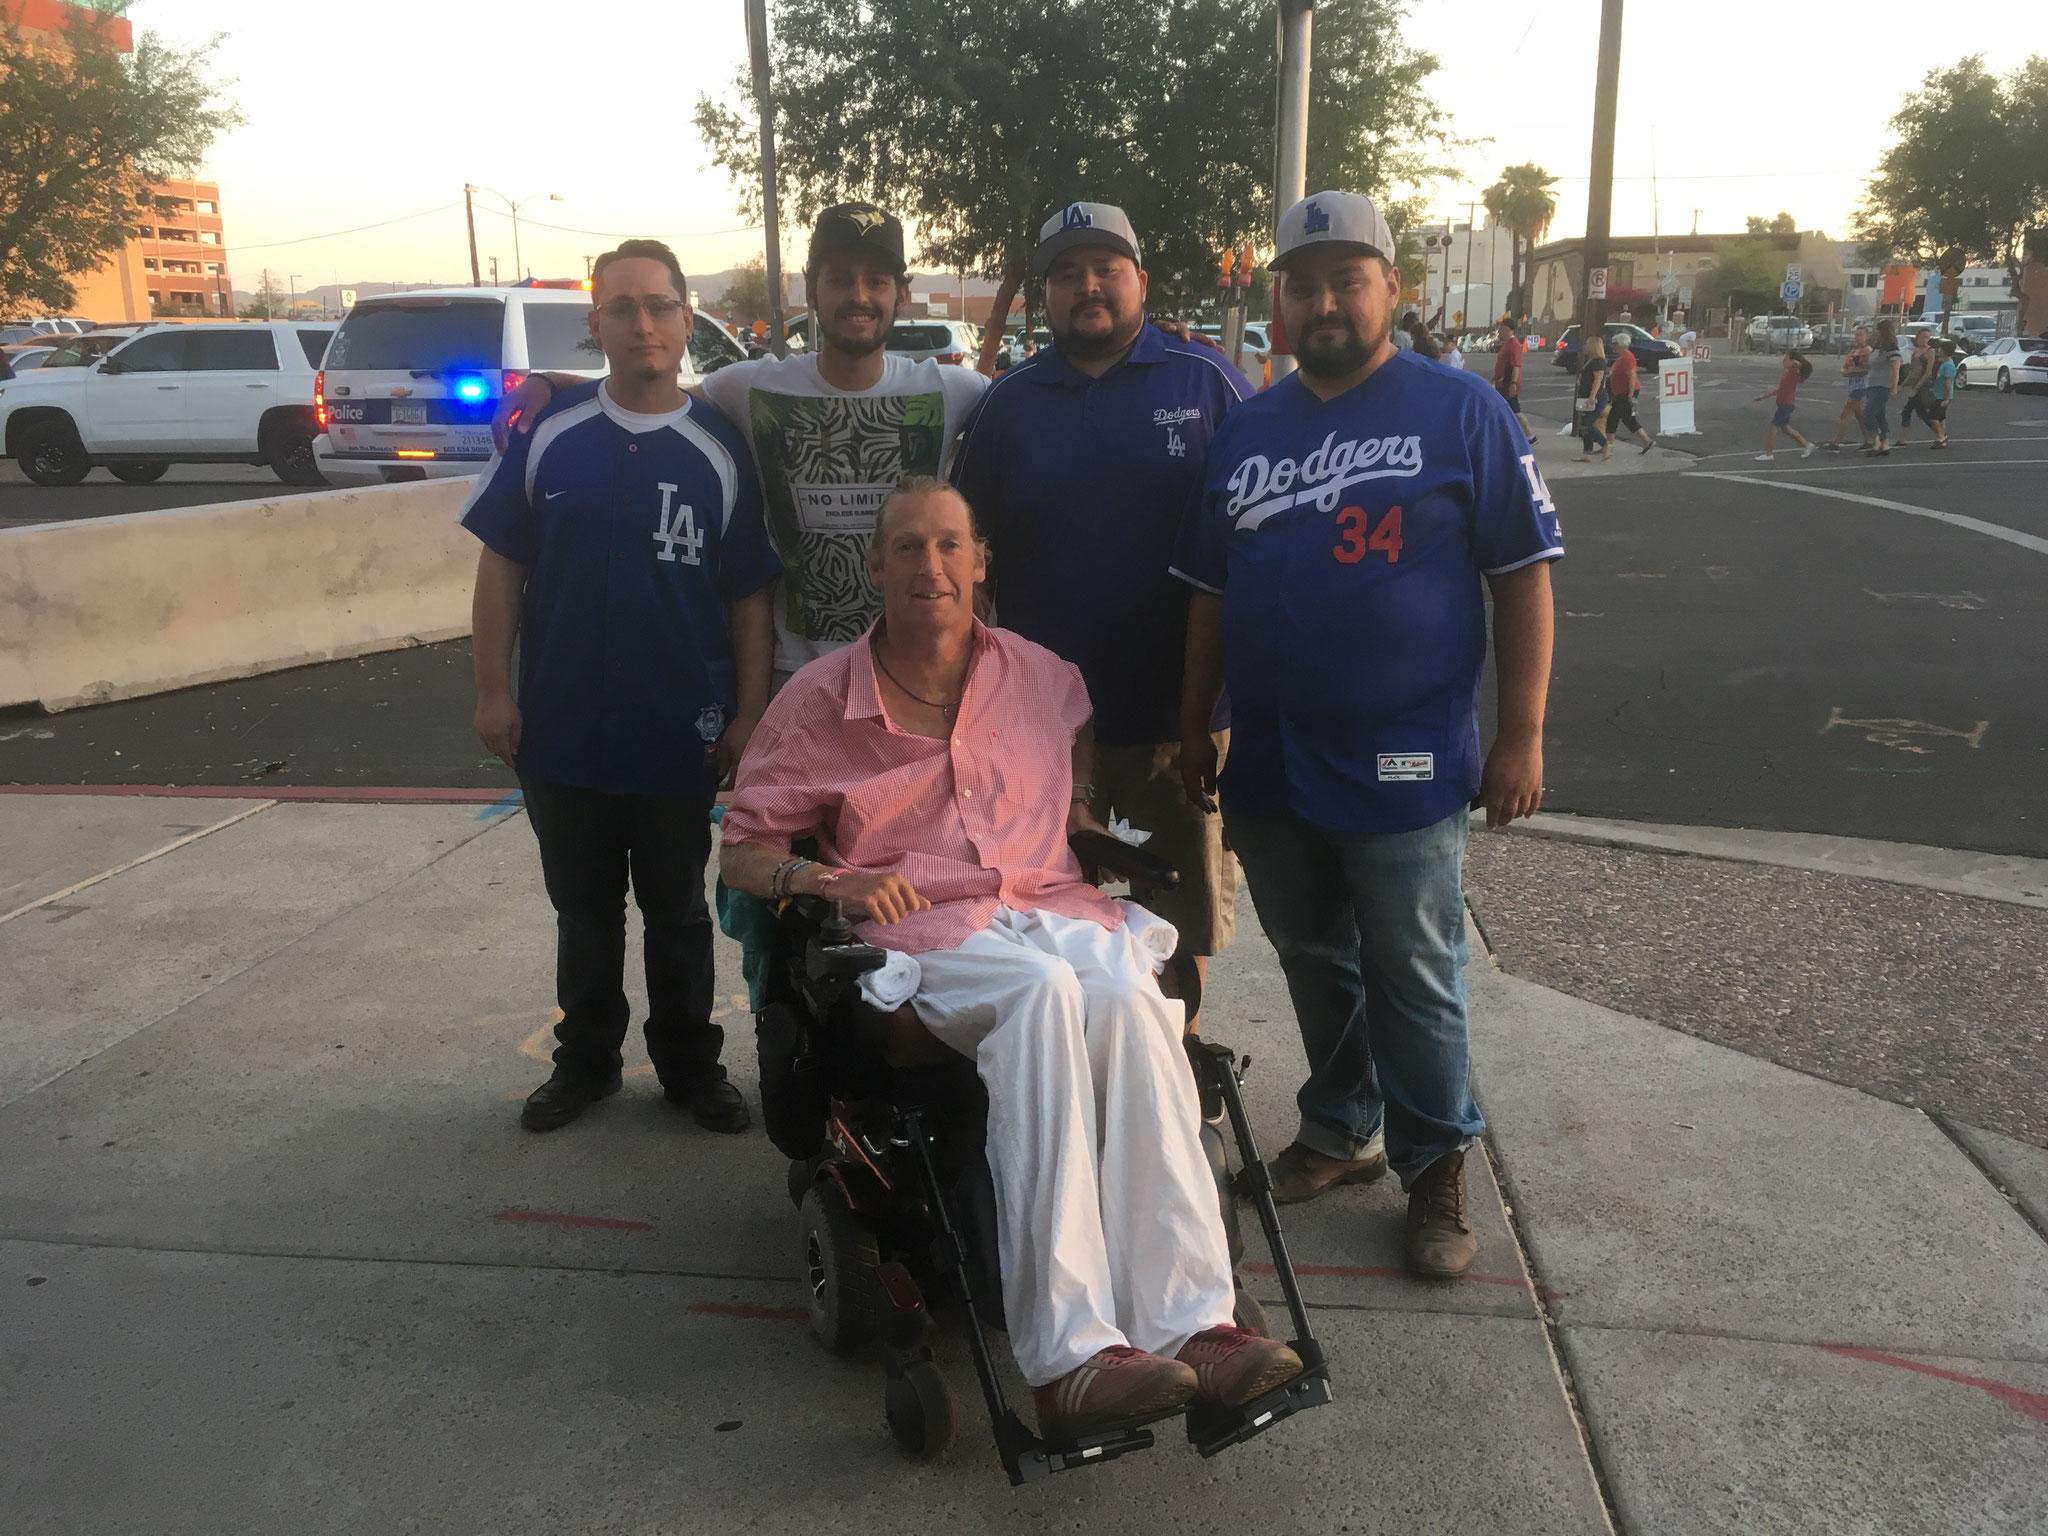 Los Angeles Dodger's Fans